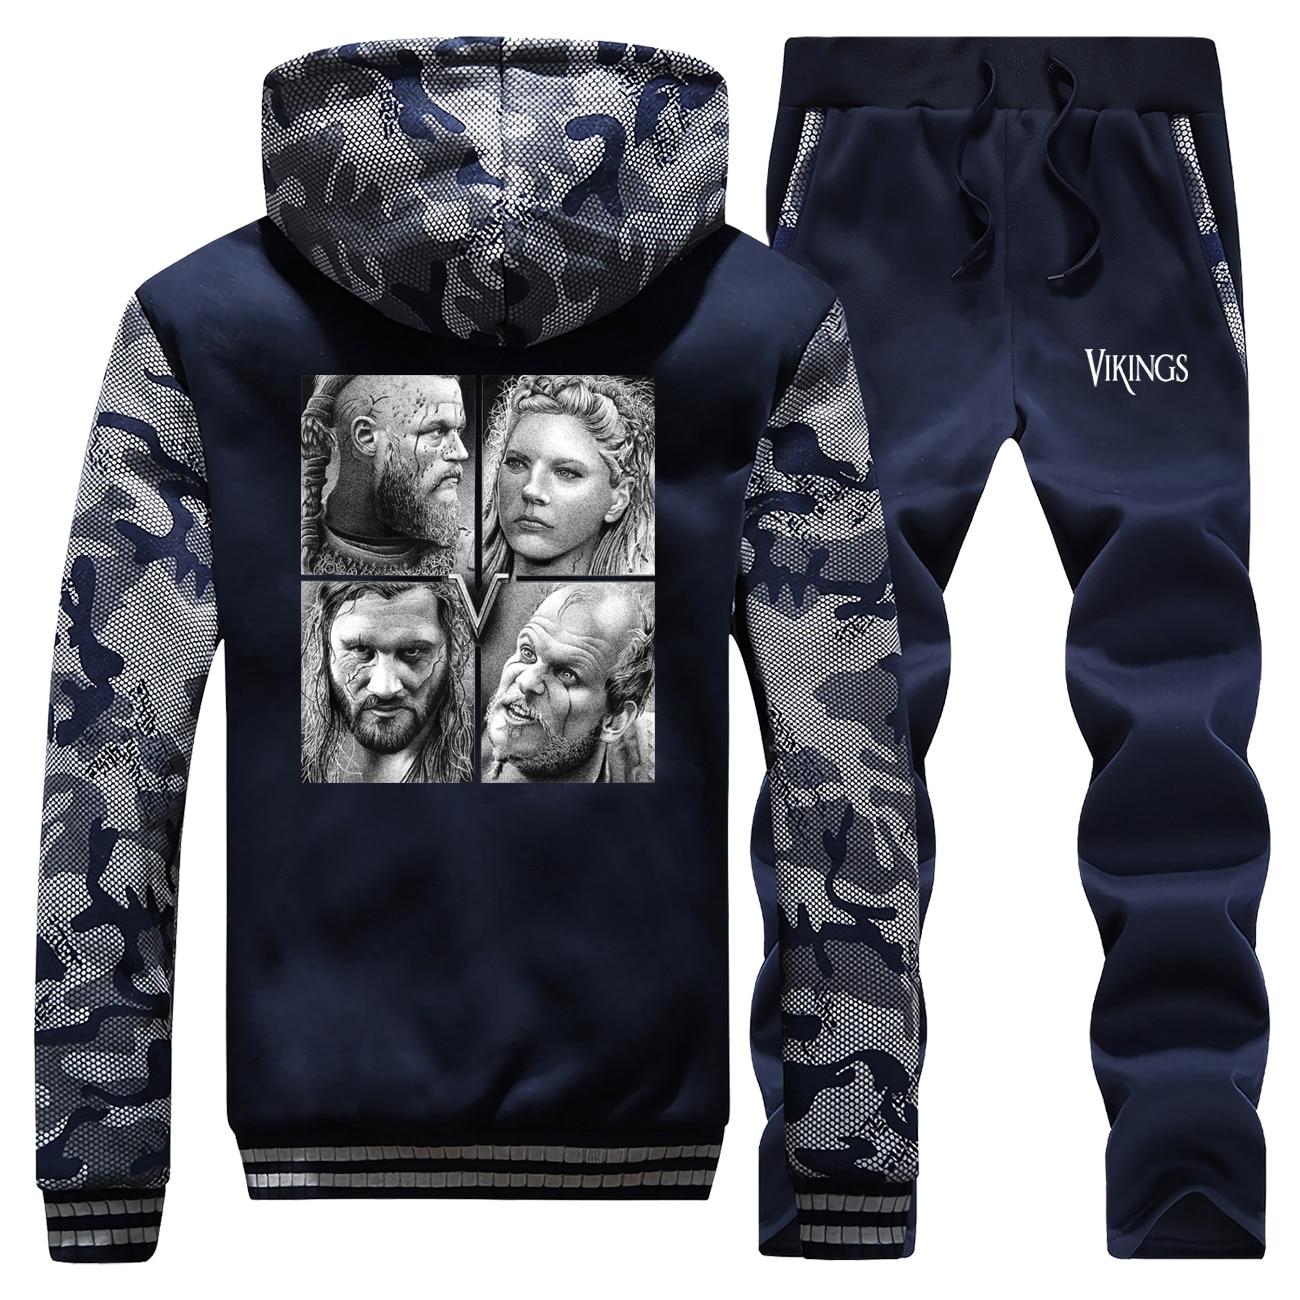 TV Show Vikings Camo Male Set Ragnar Zipper Thick Jakcets 2019 Winter Warm Pants Sweatshirt Fleece Men's Full Suit Tracksuit